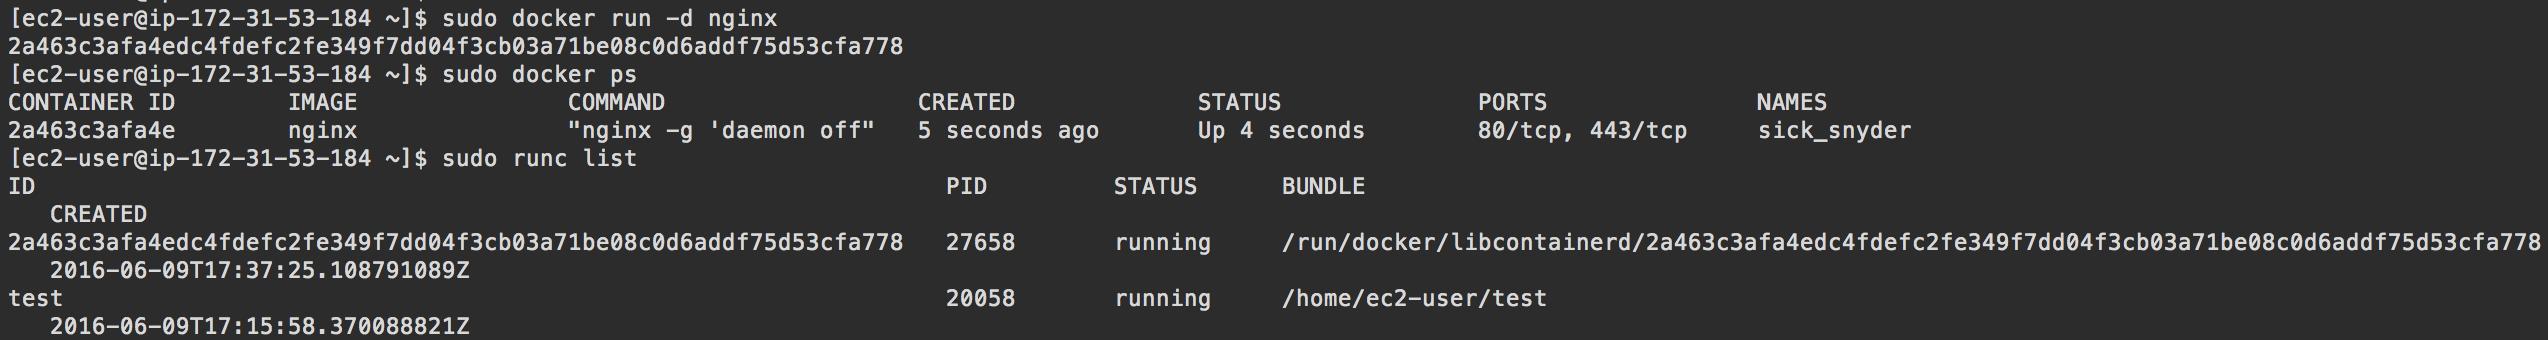 Comparing Docker to Runc